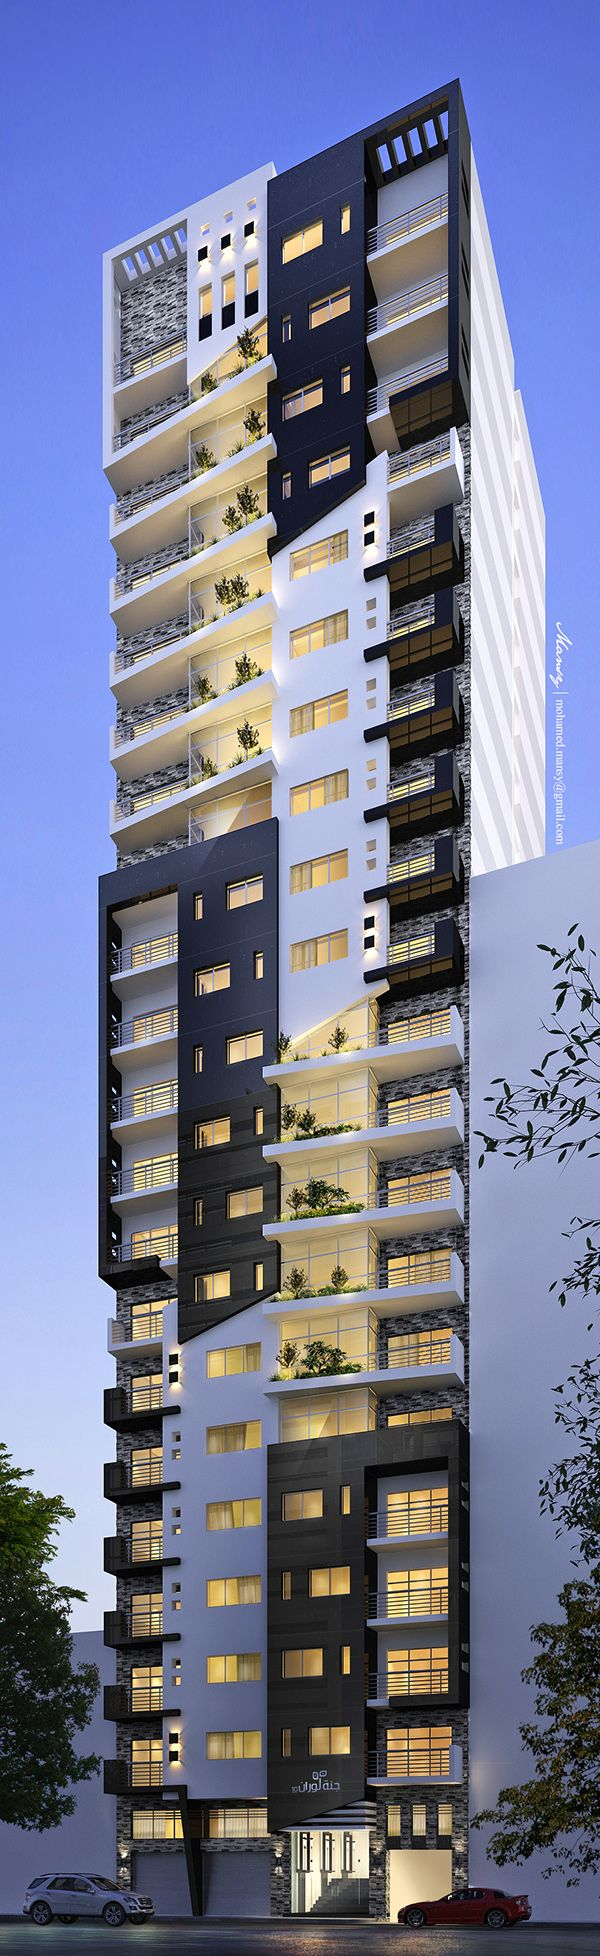 Exacta Imoveis: Projetos Para Conhecer... Loran High Rise Residential  Apartment Building